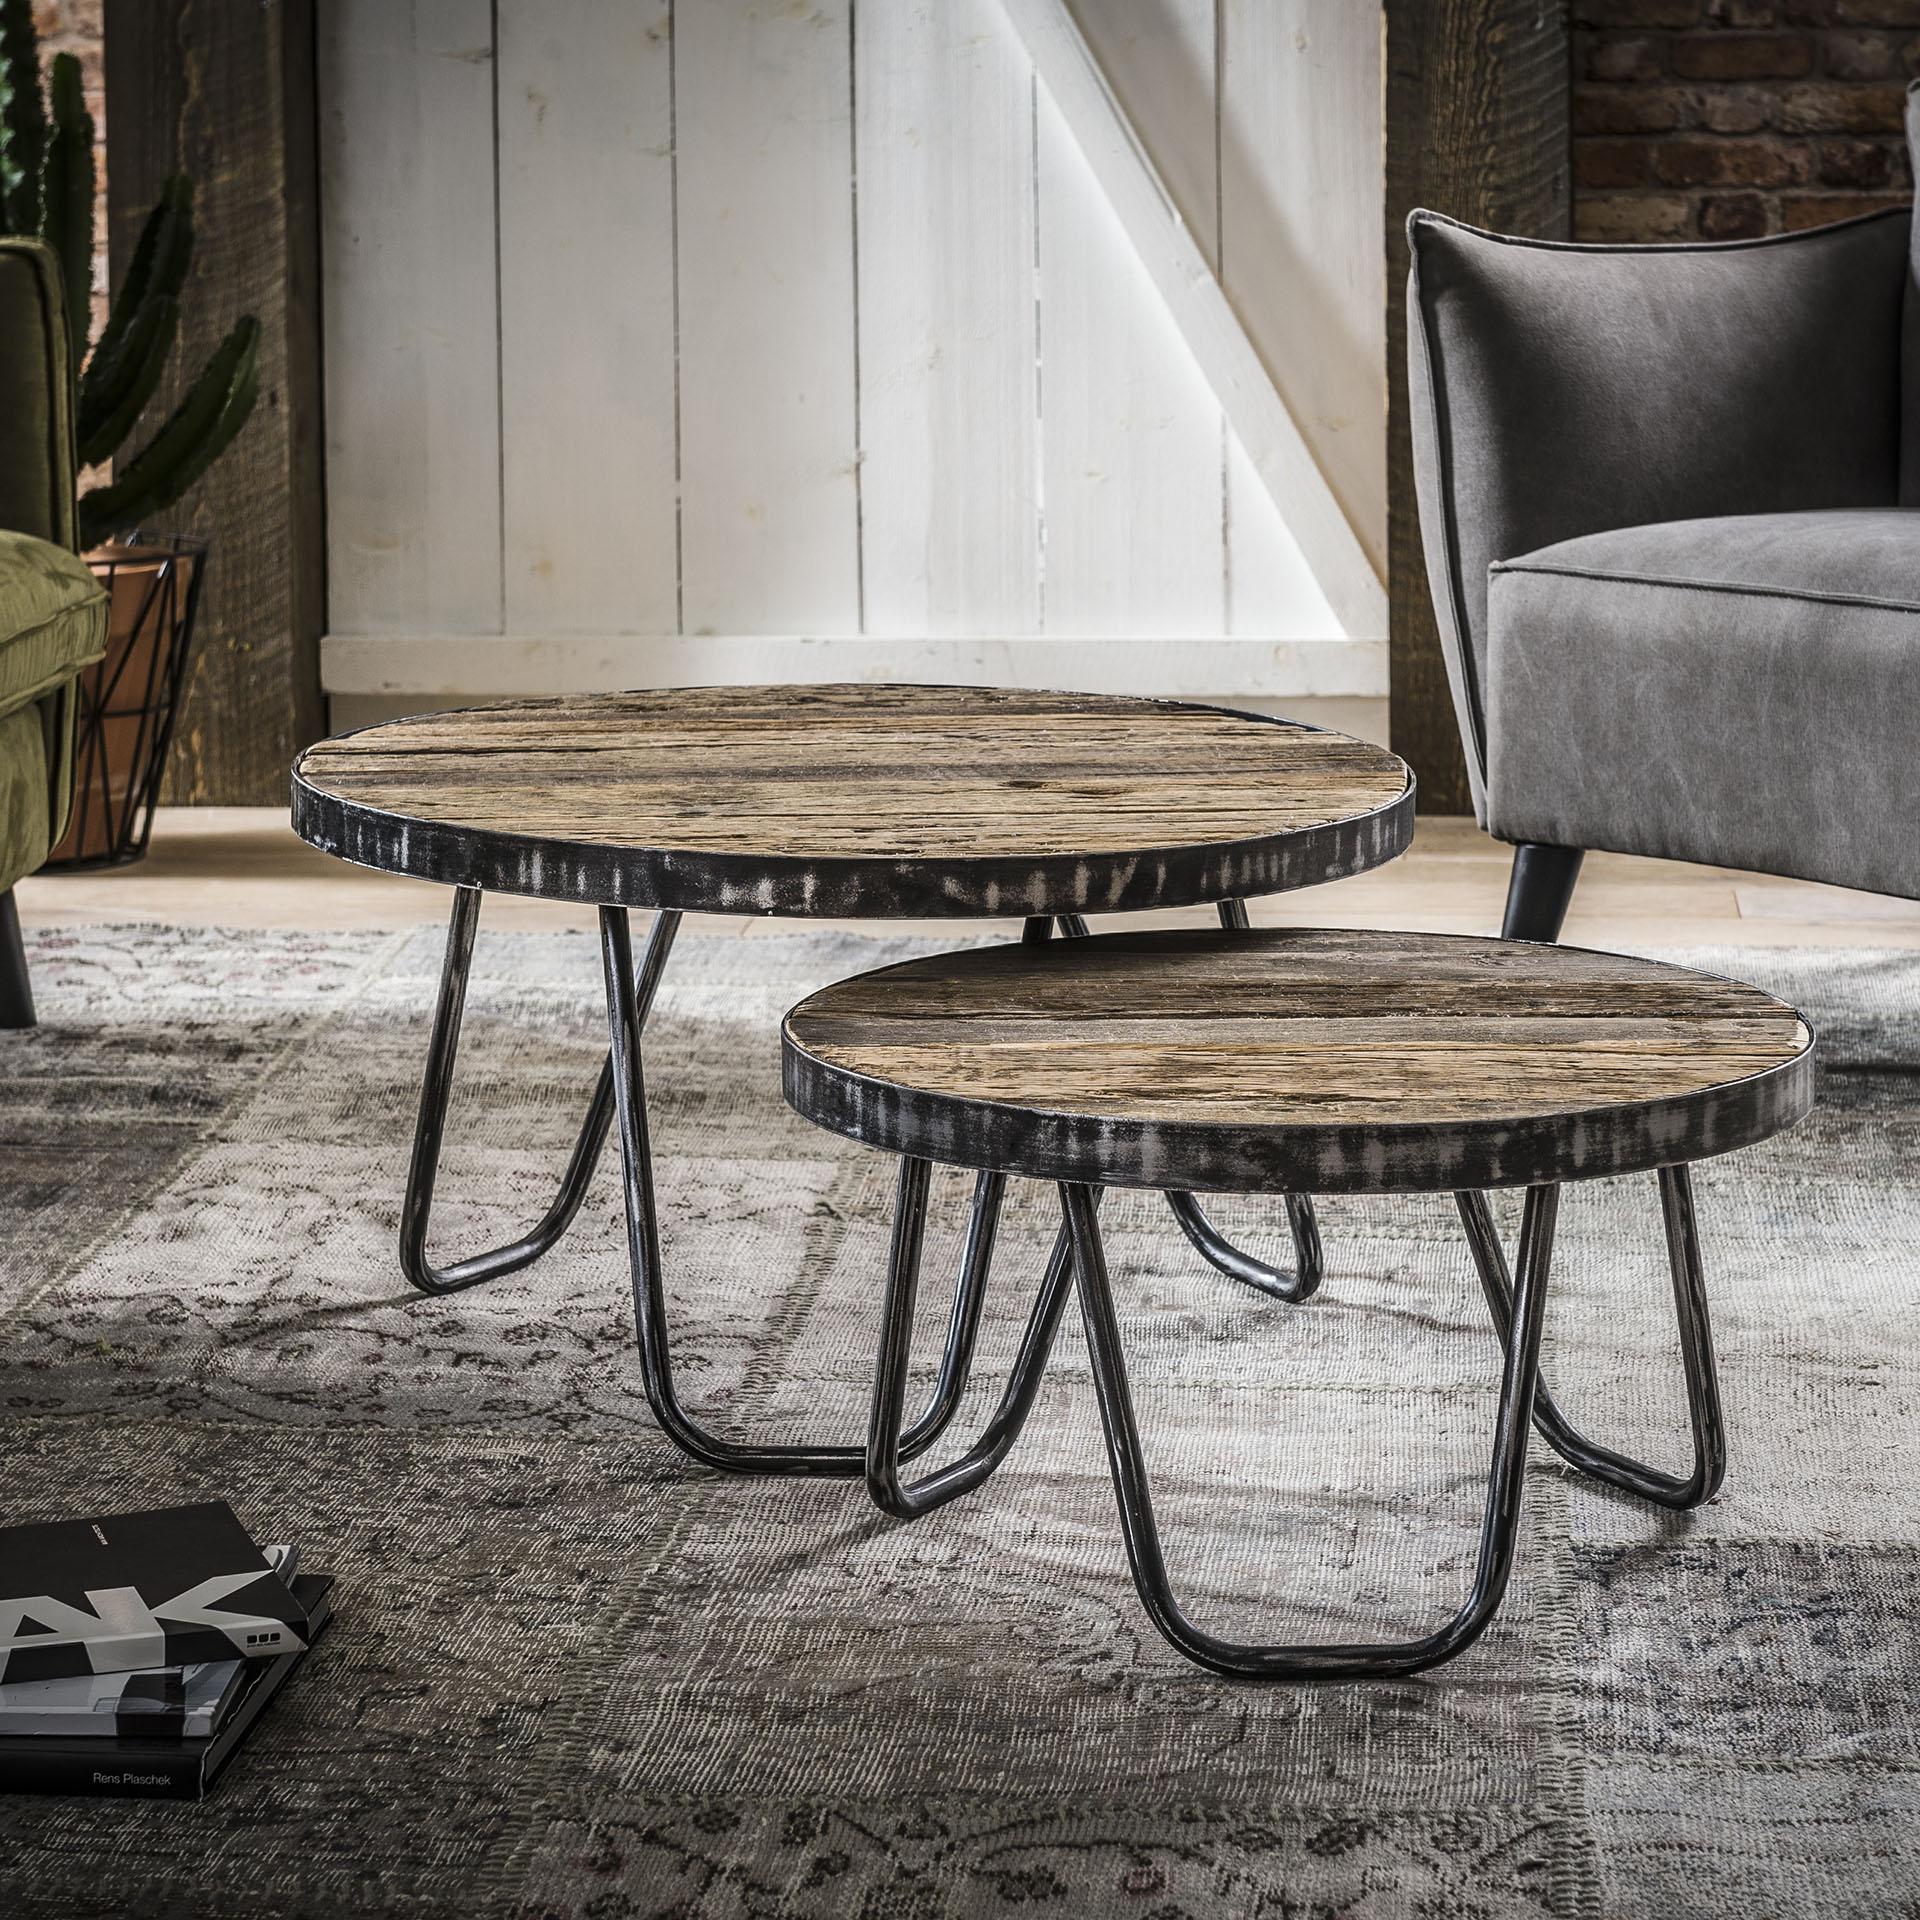 Uw partner in meubels: Salontafel 'Lesley' Set van 2 stuks Tafels | Salontafels